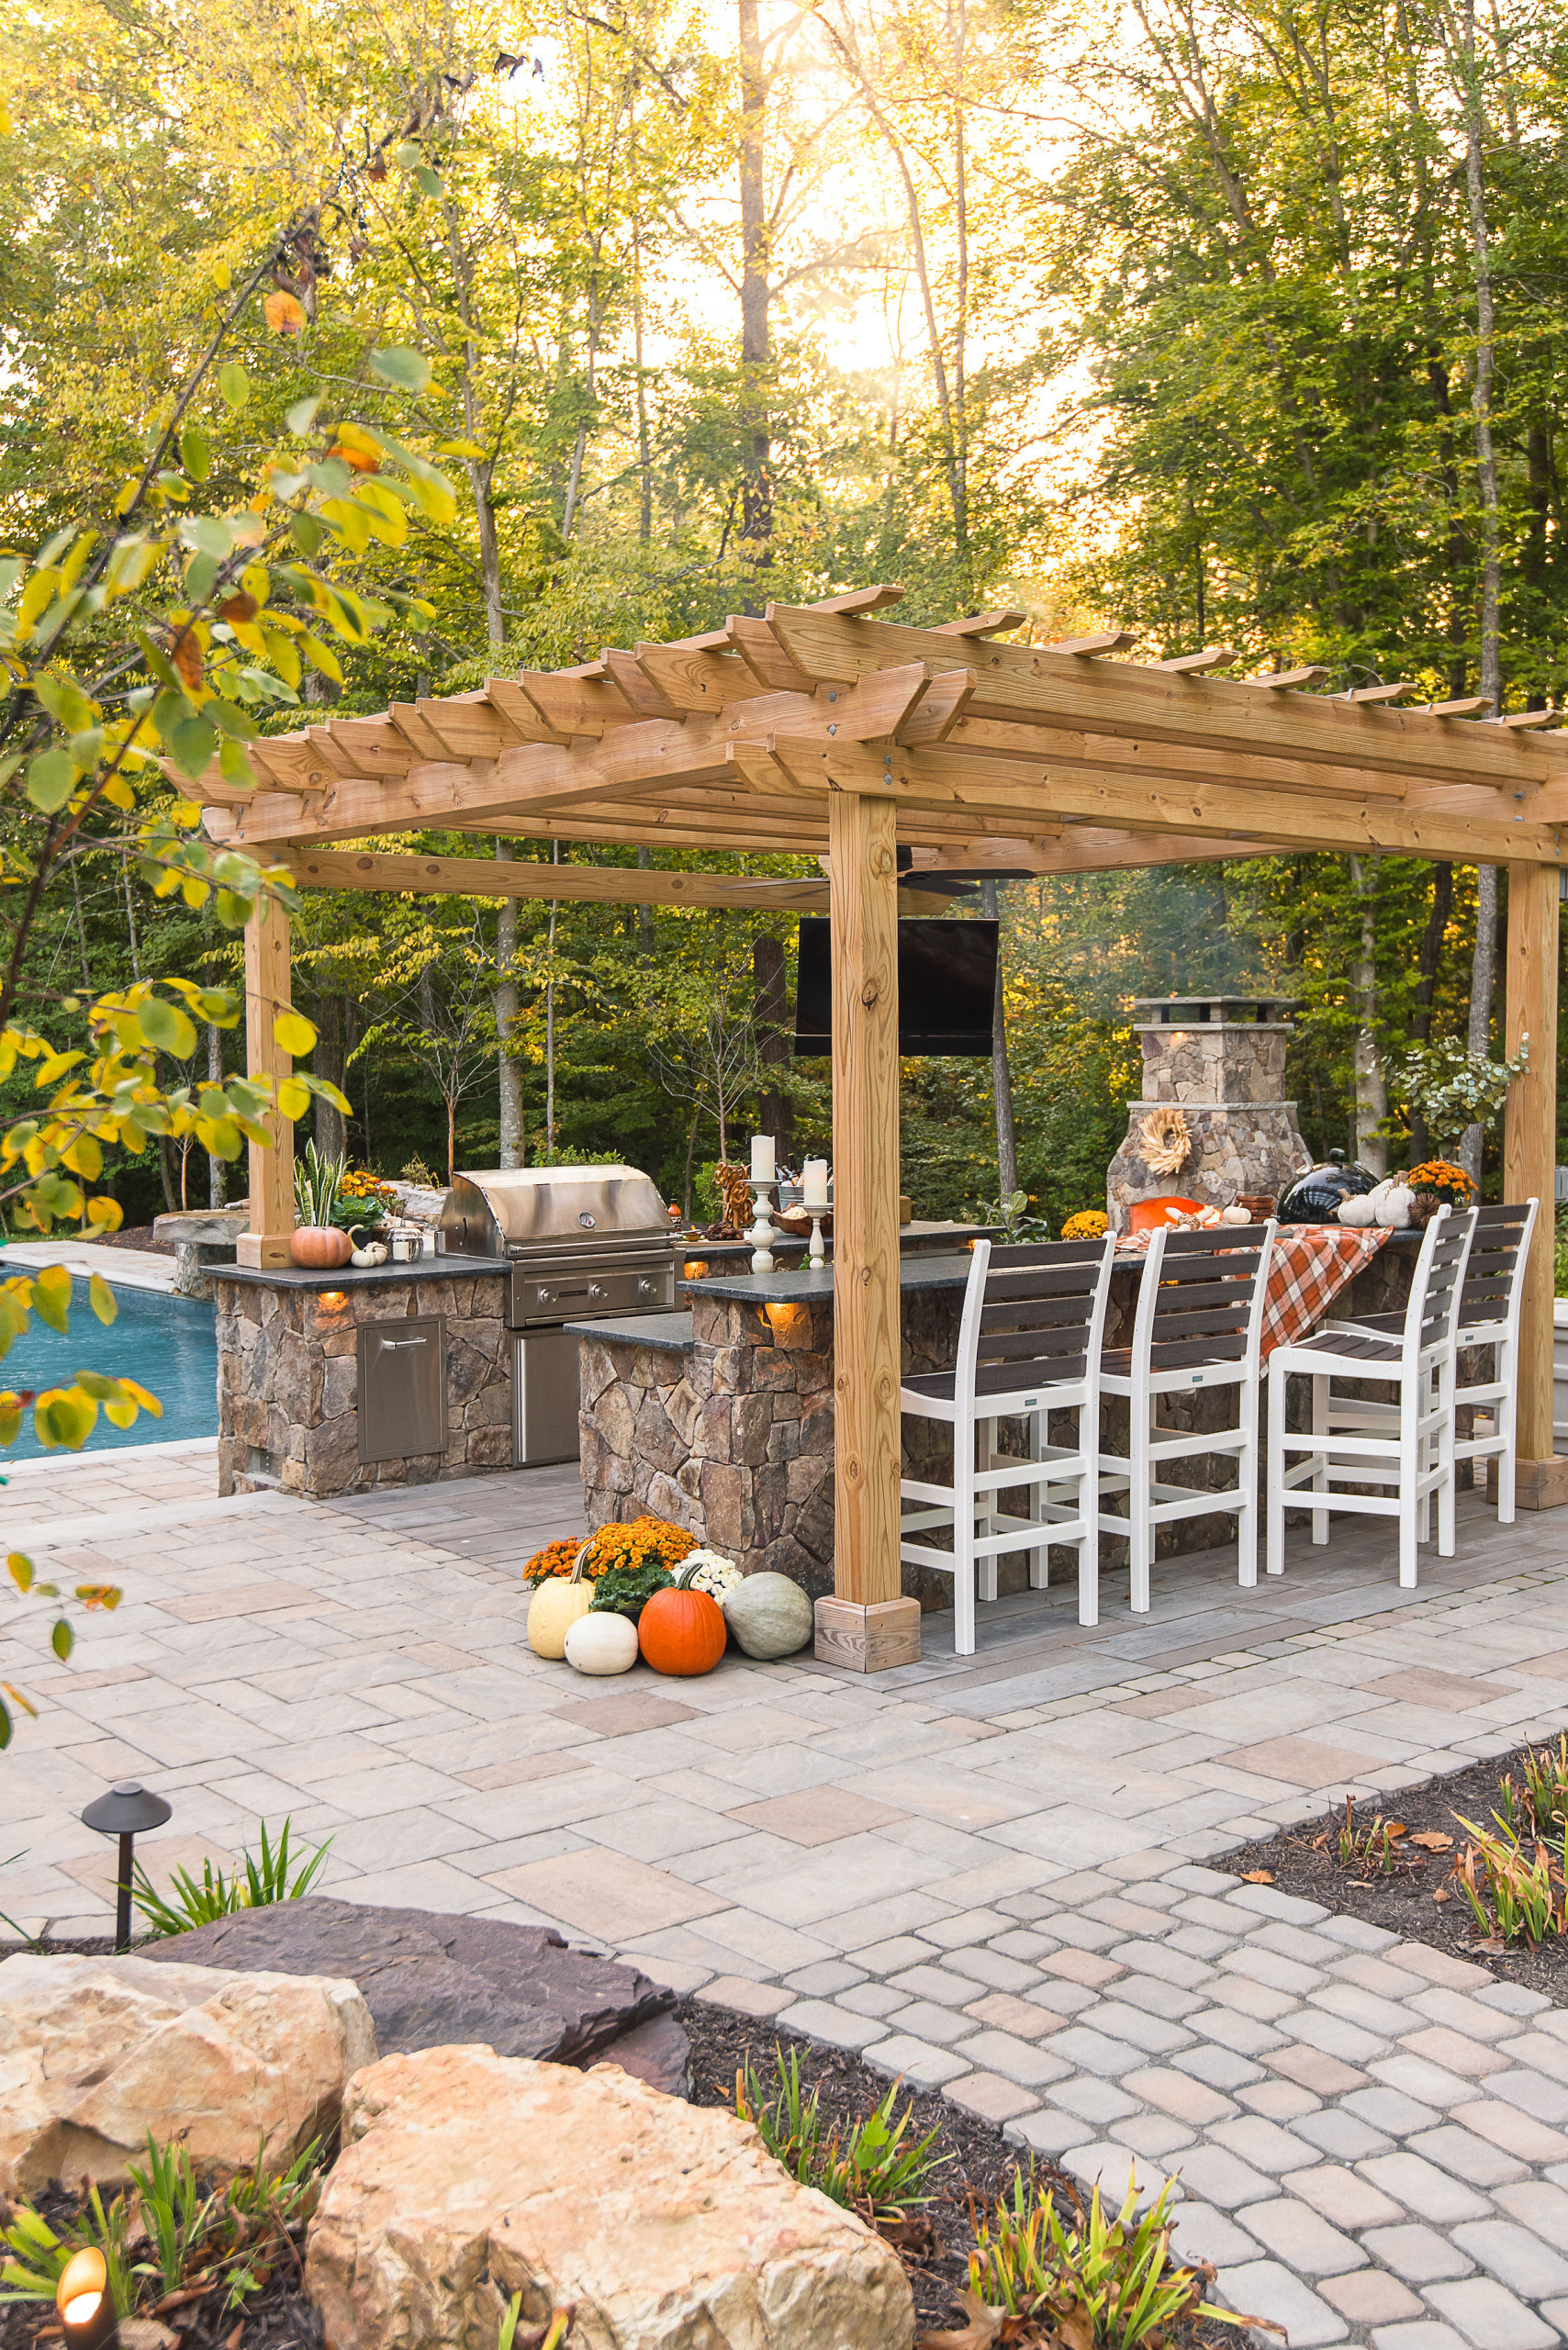 75 Beautiful Outdoor Kitchen Design Houzz Pictures Ideas July 2021 Houzz